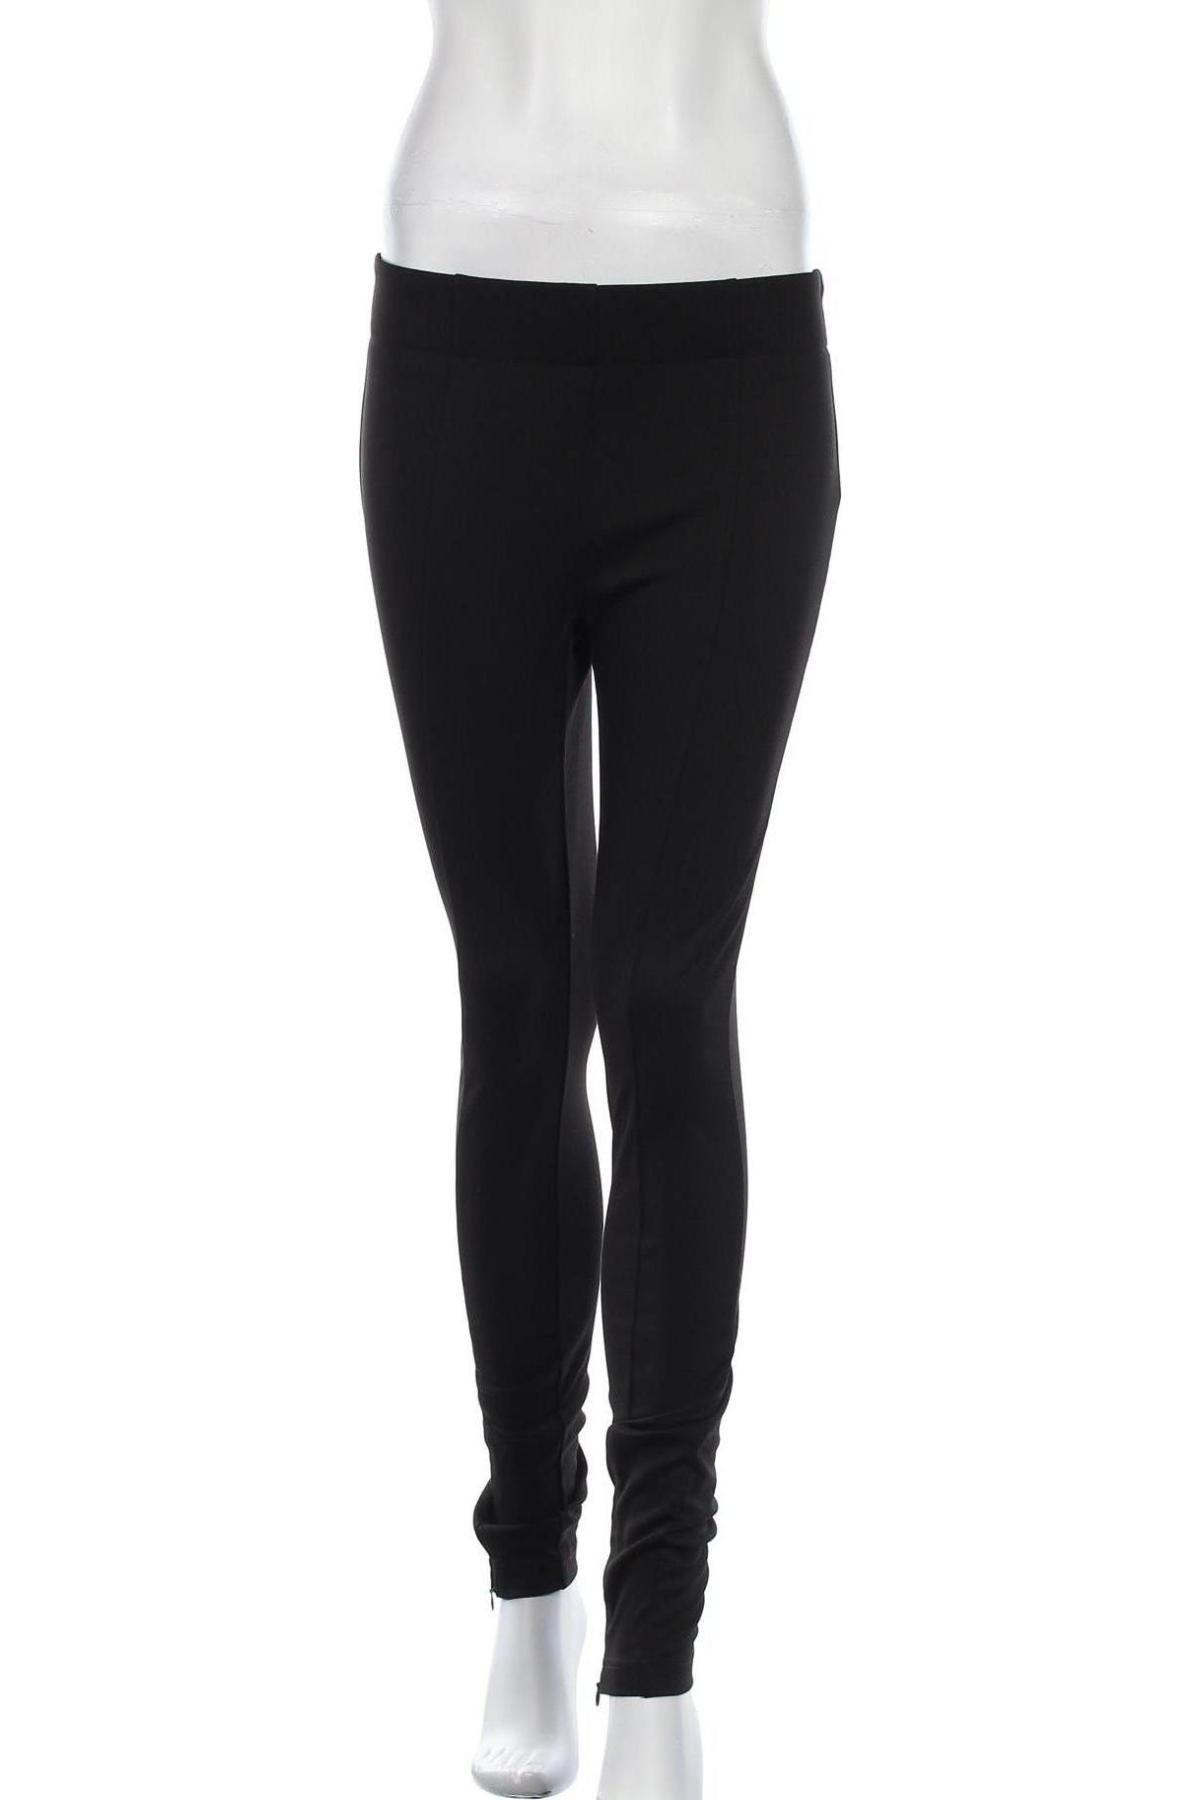 Дамски панталон Aware by Vero Moda, Размер S, Цвят Черен, 70% полиестер, 25% вискоза, 5% еластан, Цена 13,80лв.